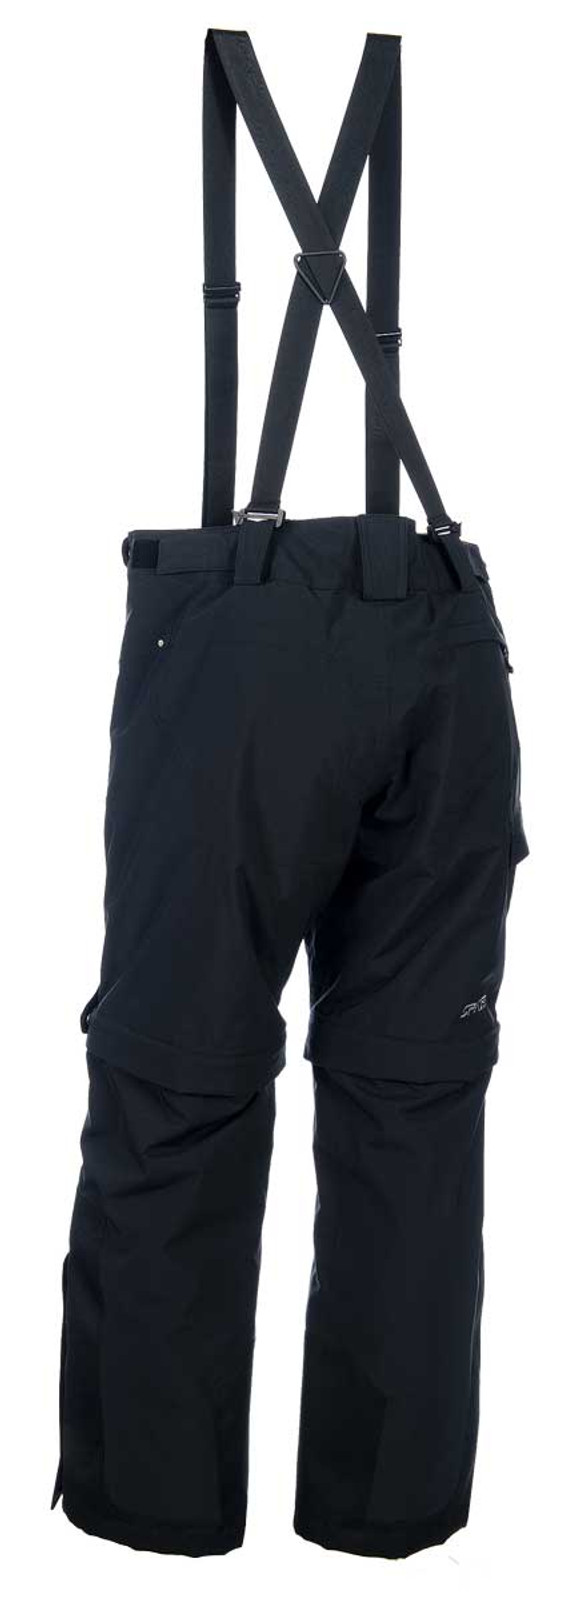 Men's Training Pants - Back